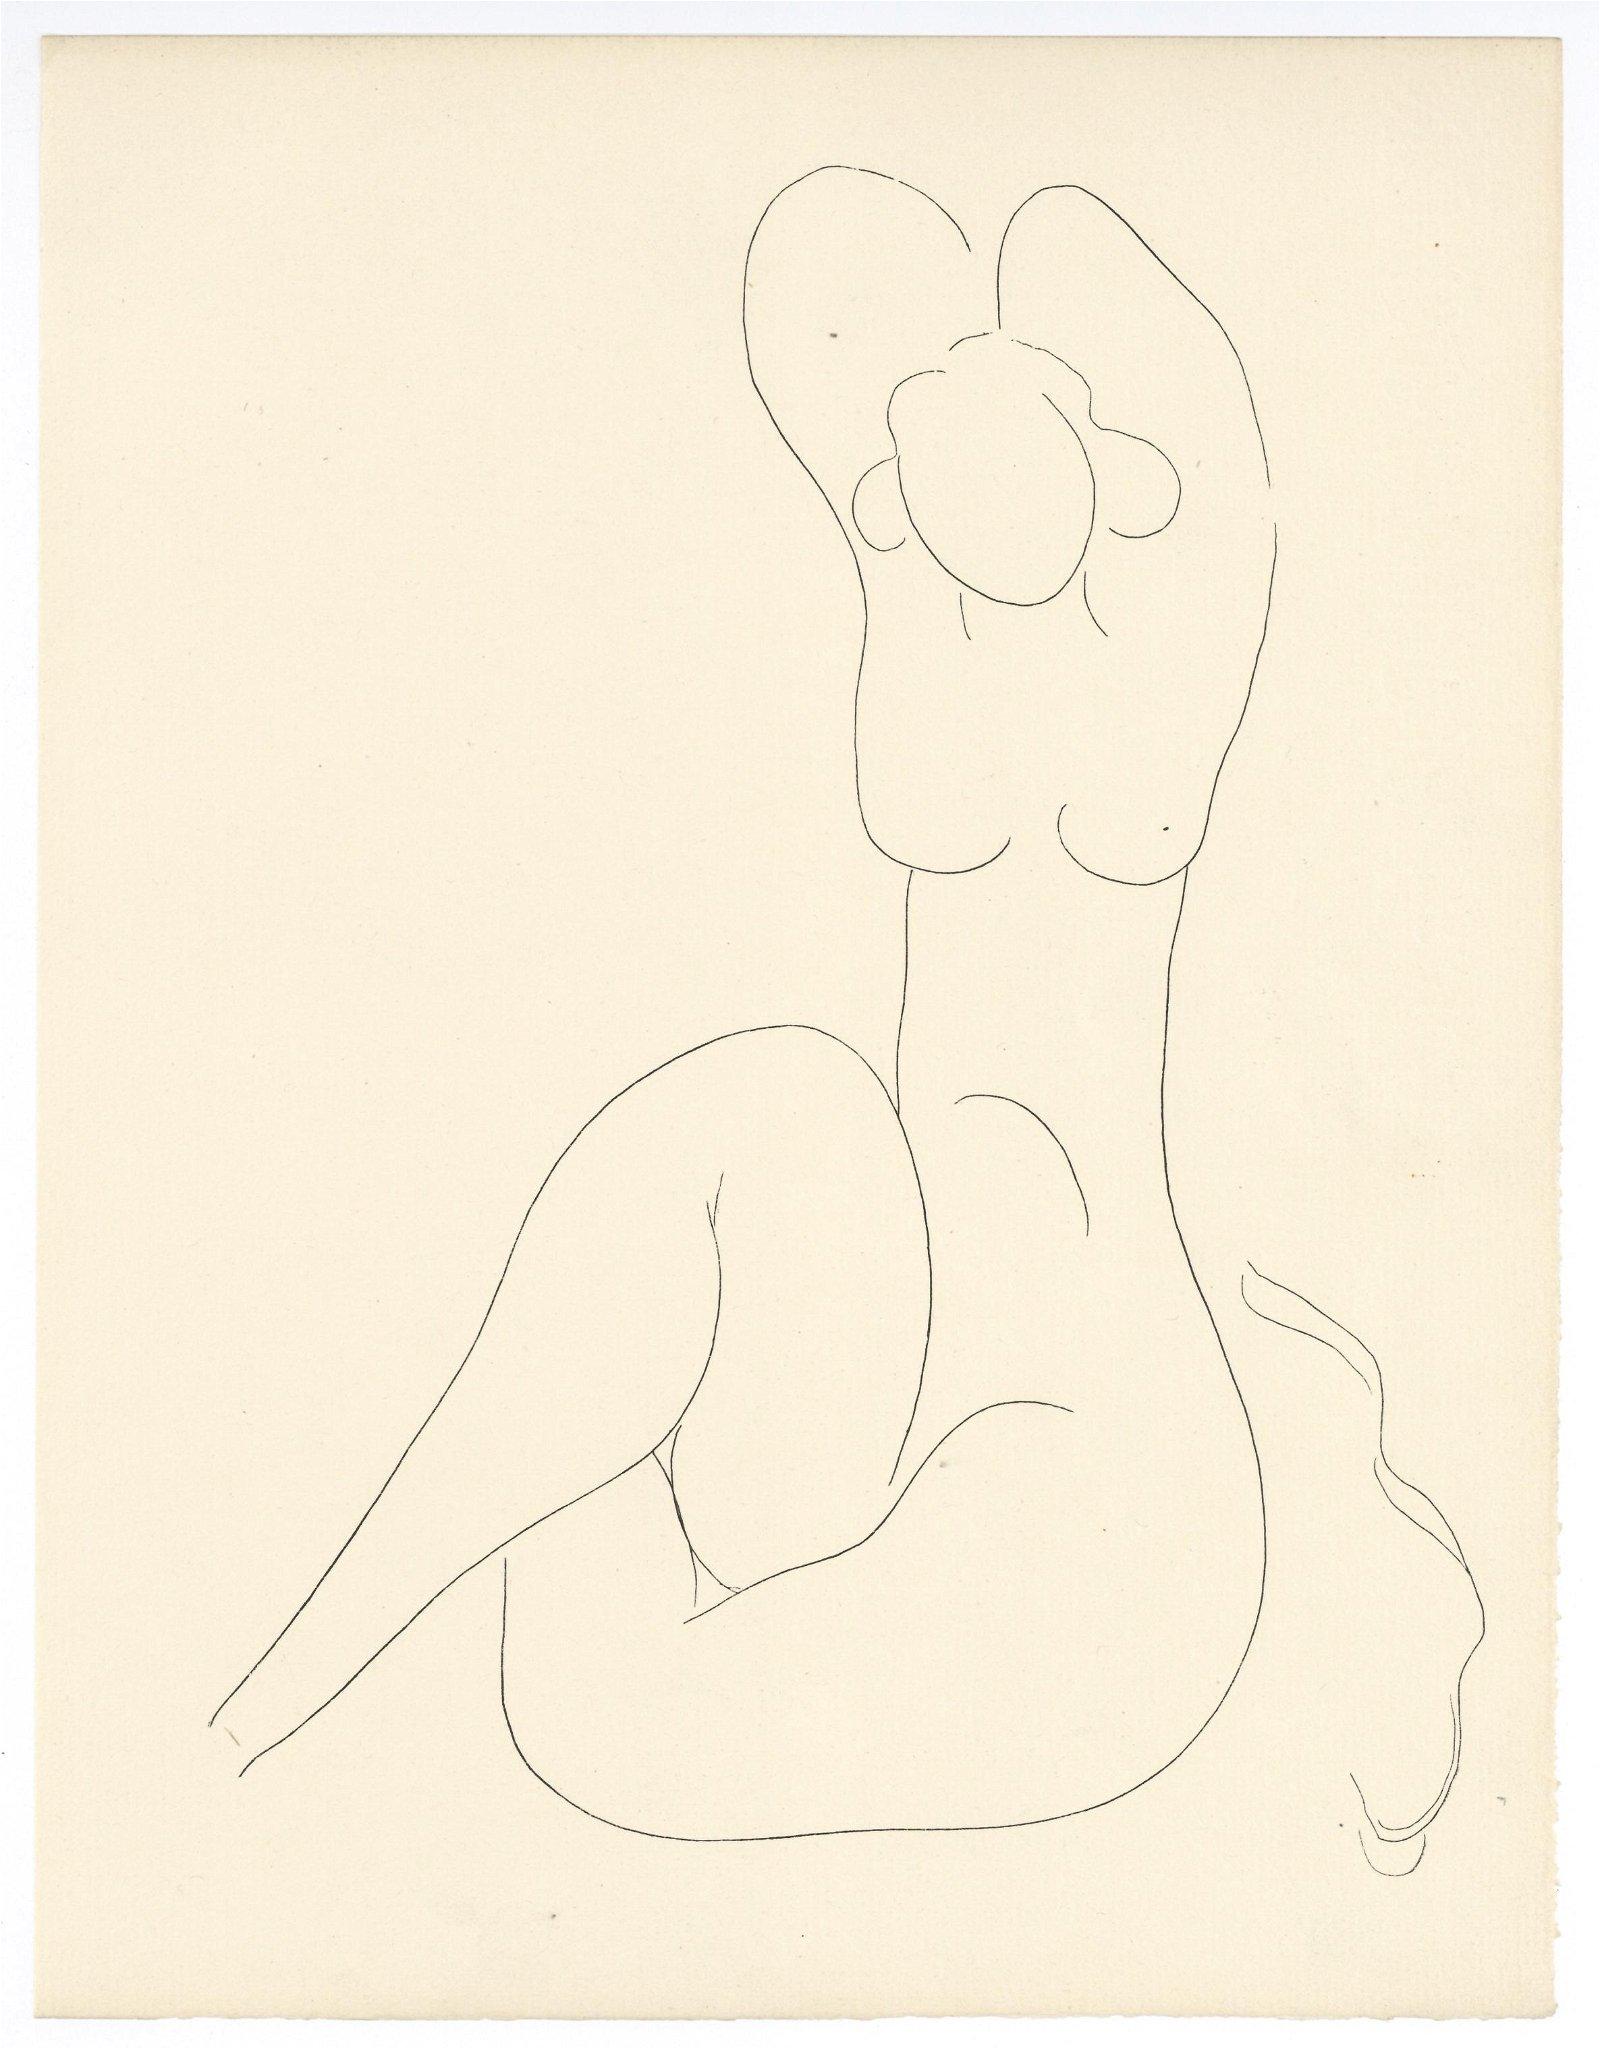 Henri Matisse engraving, 1933 | Poesies de Mallarme